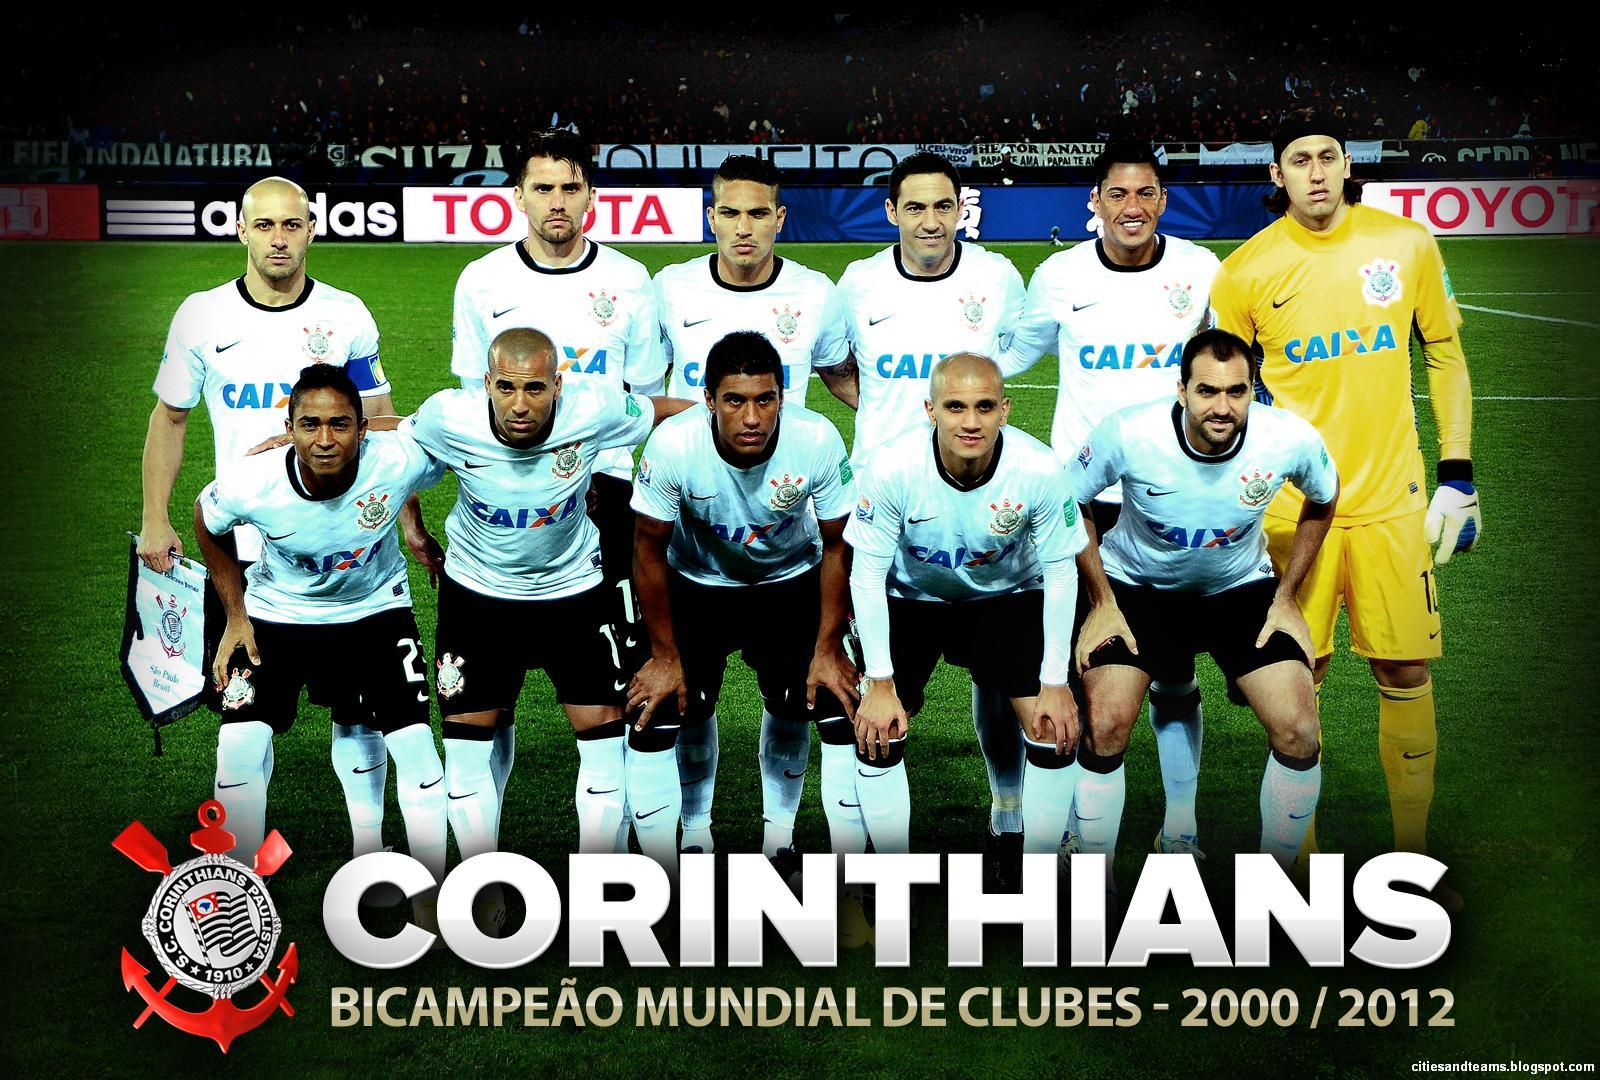 http://1.bp.blogspot.com/-AMoIVB4iAJ0/UM8xXPEWz3I/AAAAAAAAI1E/fasHBtkfxlY/s1600/Corinthians_Fifa_World_Club_Champion_2012_In_Yokahoma_Stadium_Japan_Hd_Desktop_Wallpaper_2_citiesandteams.blogspot.com.jpg